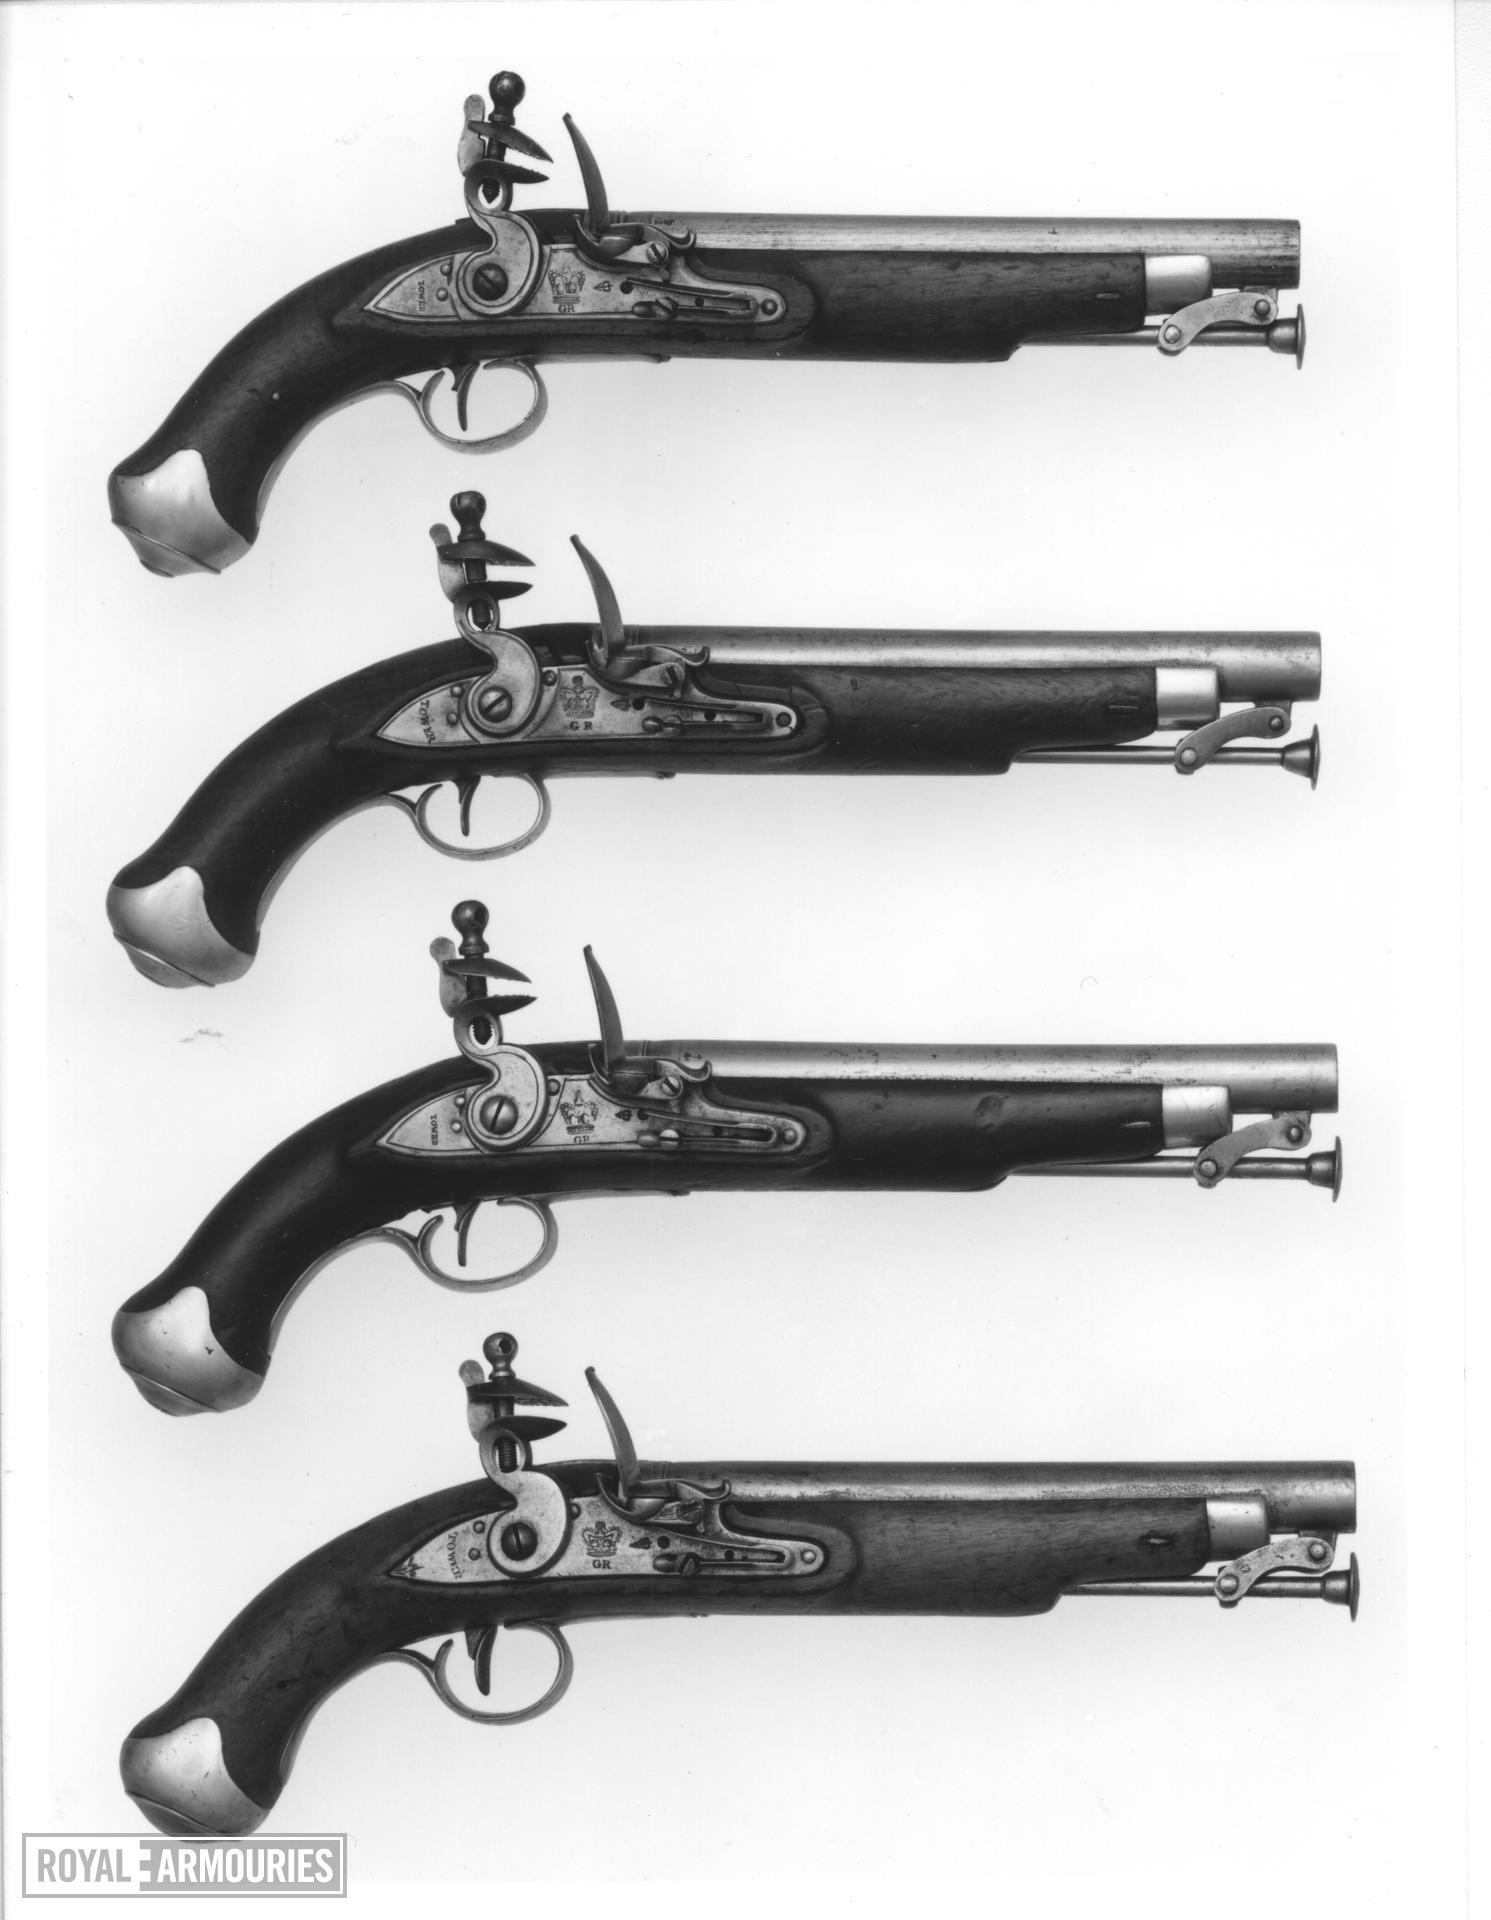 Flintlock military pistol - New Land Pattern